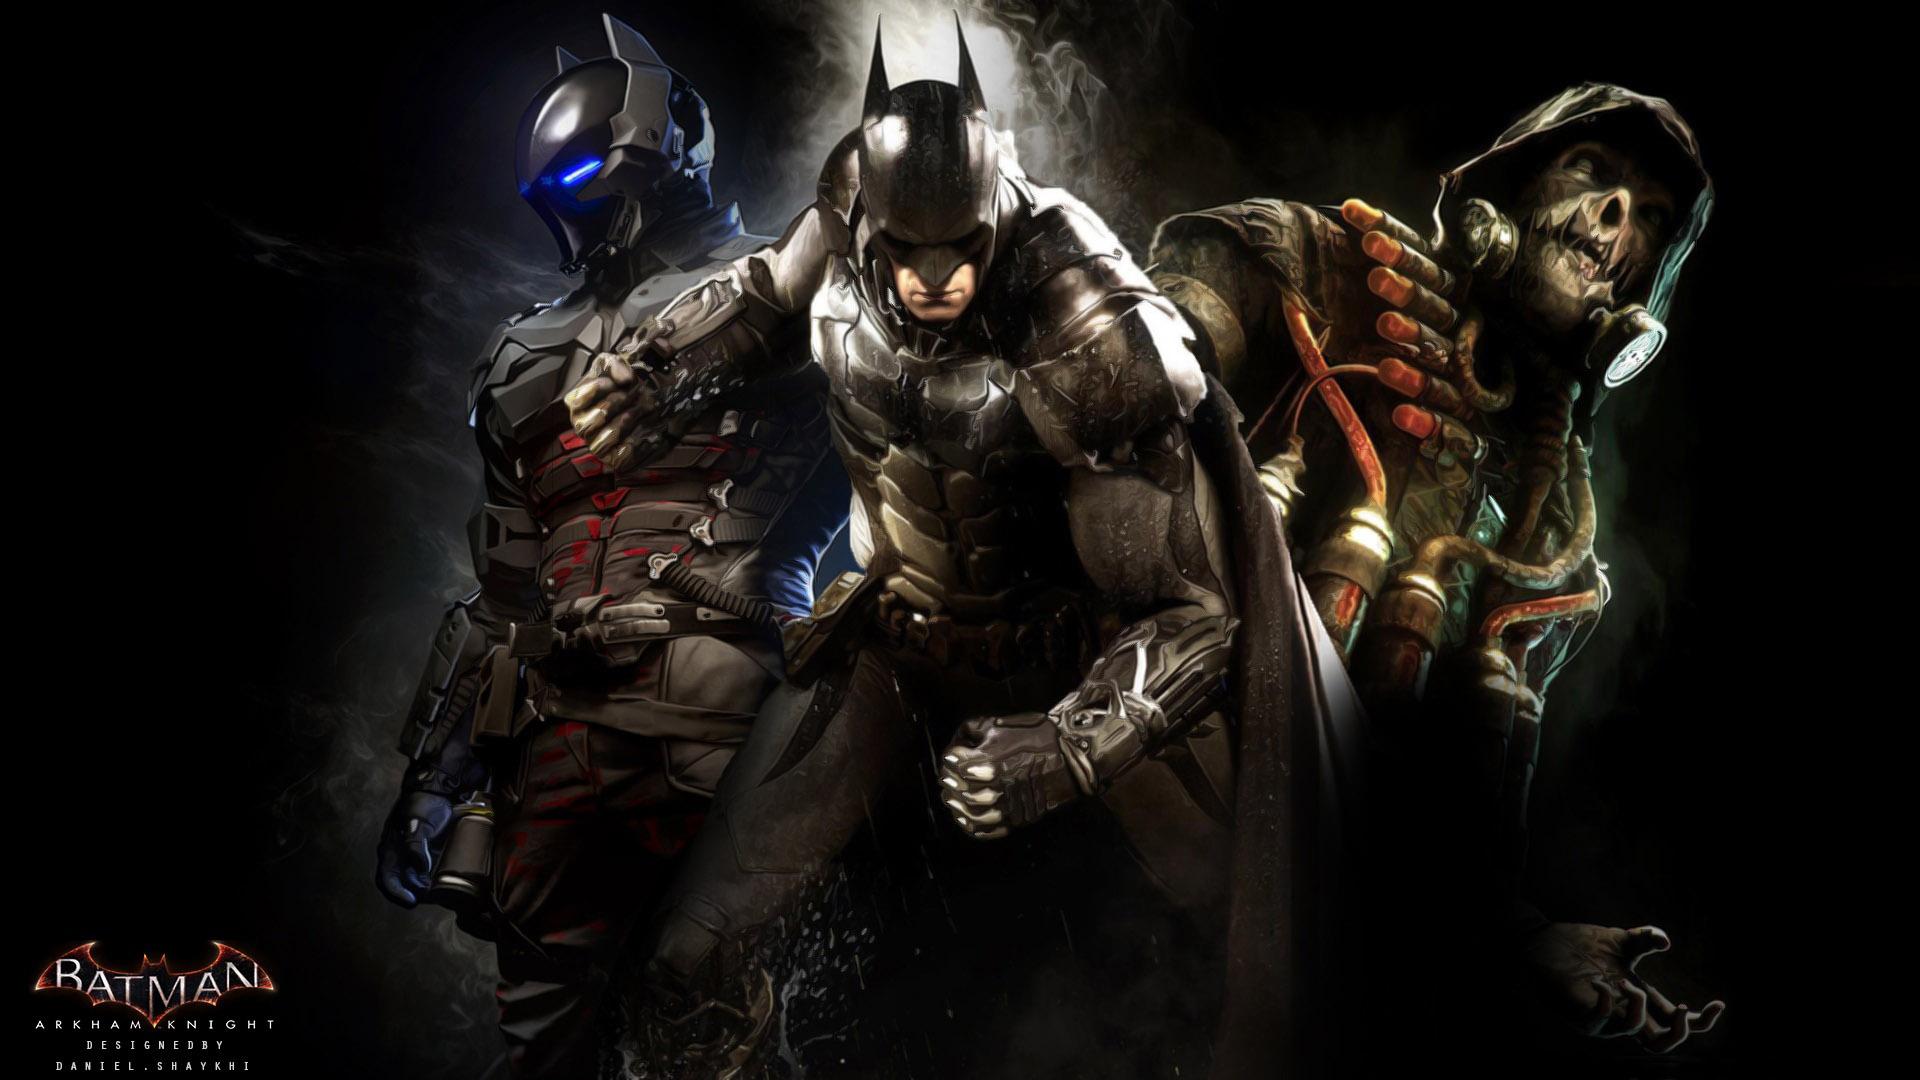 45 Batman Arkham Knight Batgirl Wallpaper On Wallpapersafari